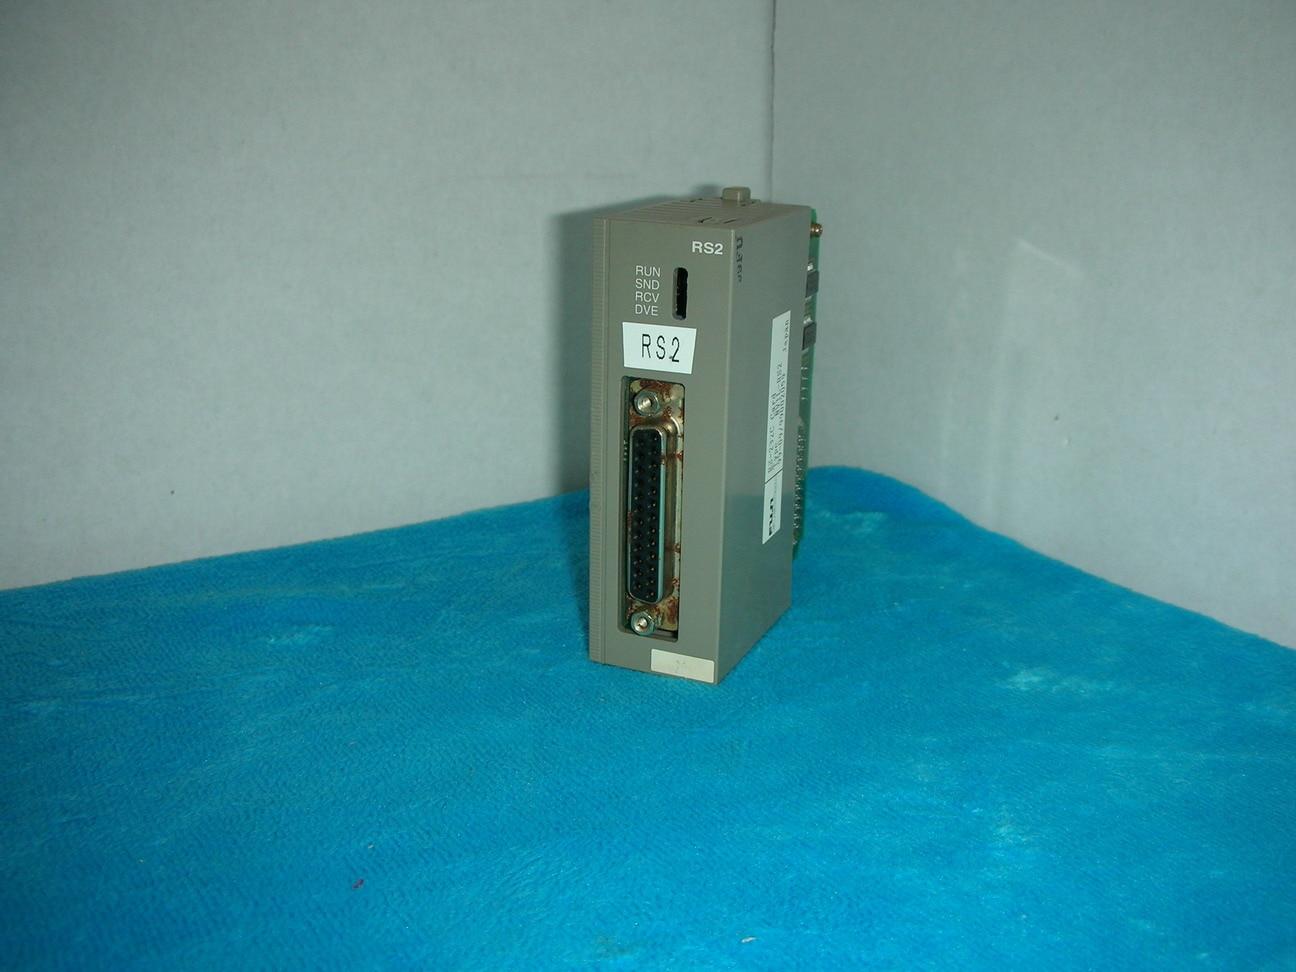 Disassemble the original Fuji NV1L-RS2